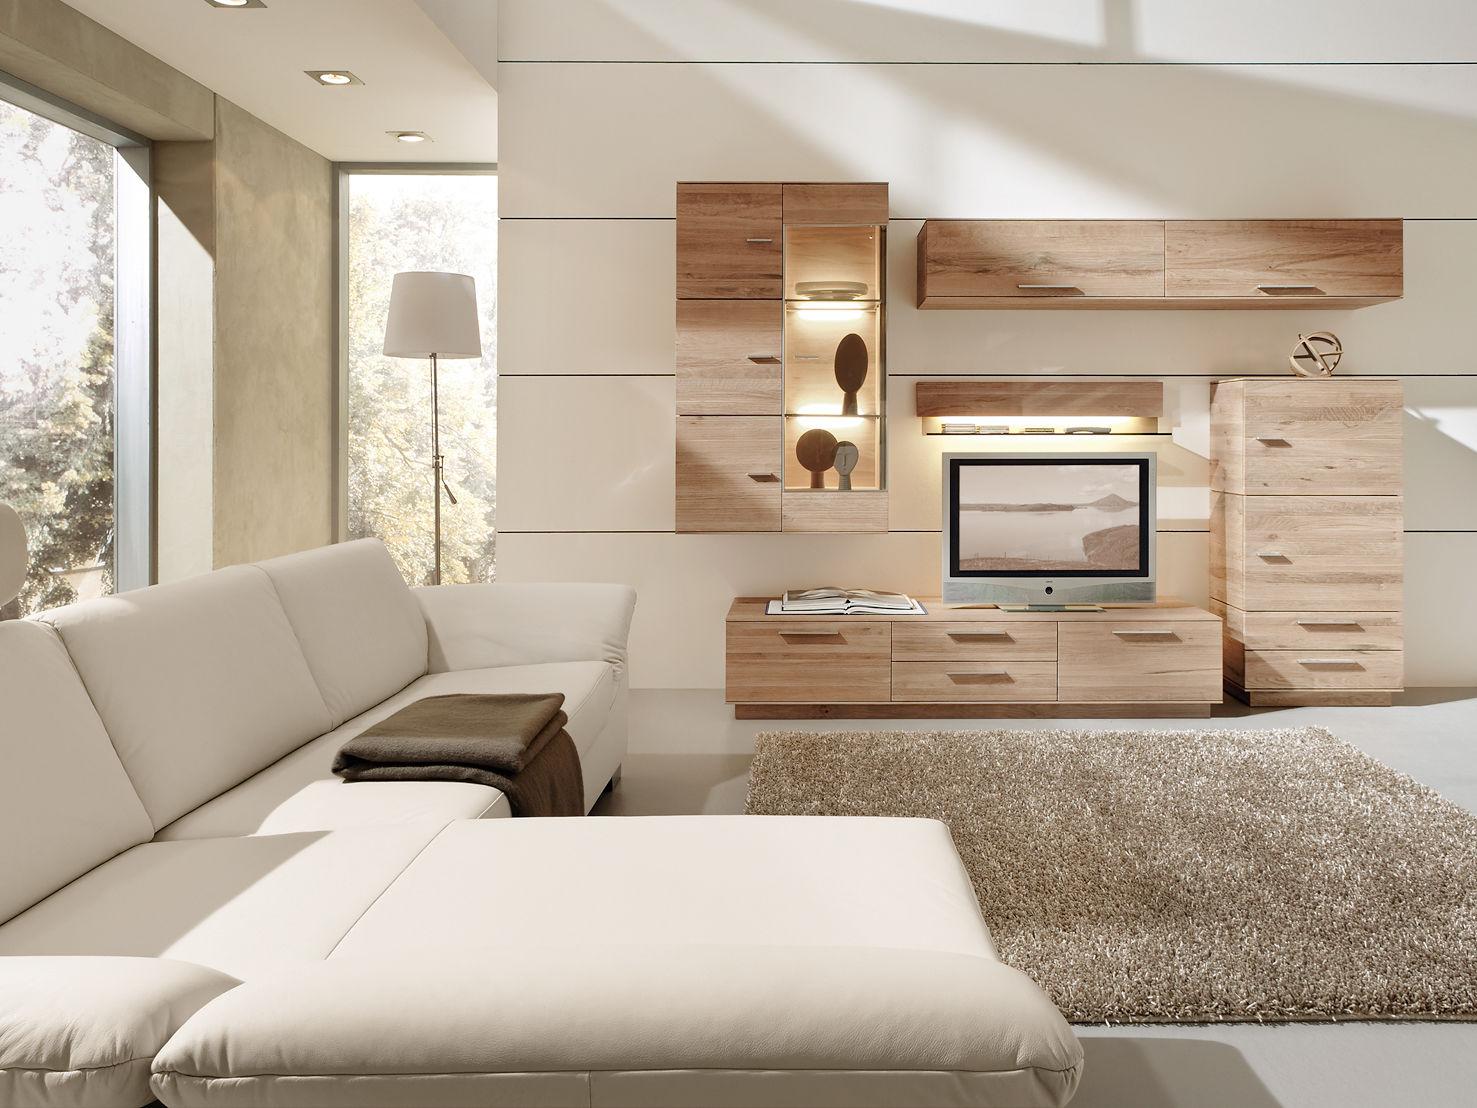 helles holz im trend zuhause wohnen. Black Bedroom Furniture Sets. Home Design Ideas